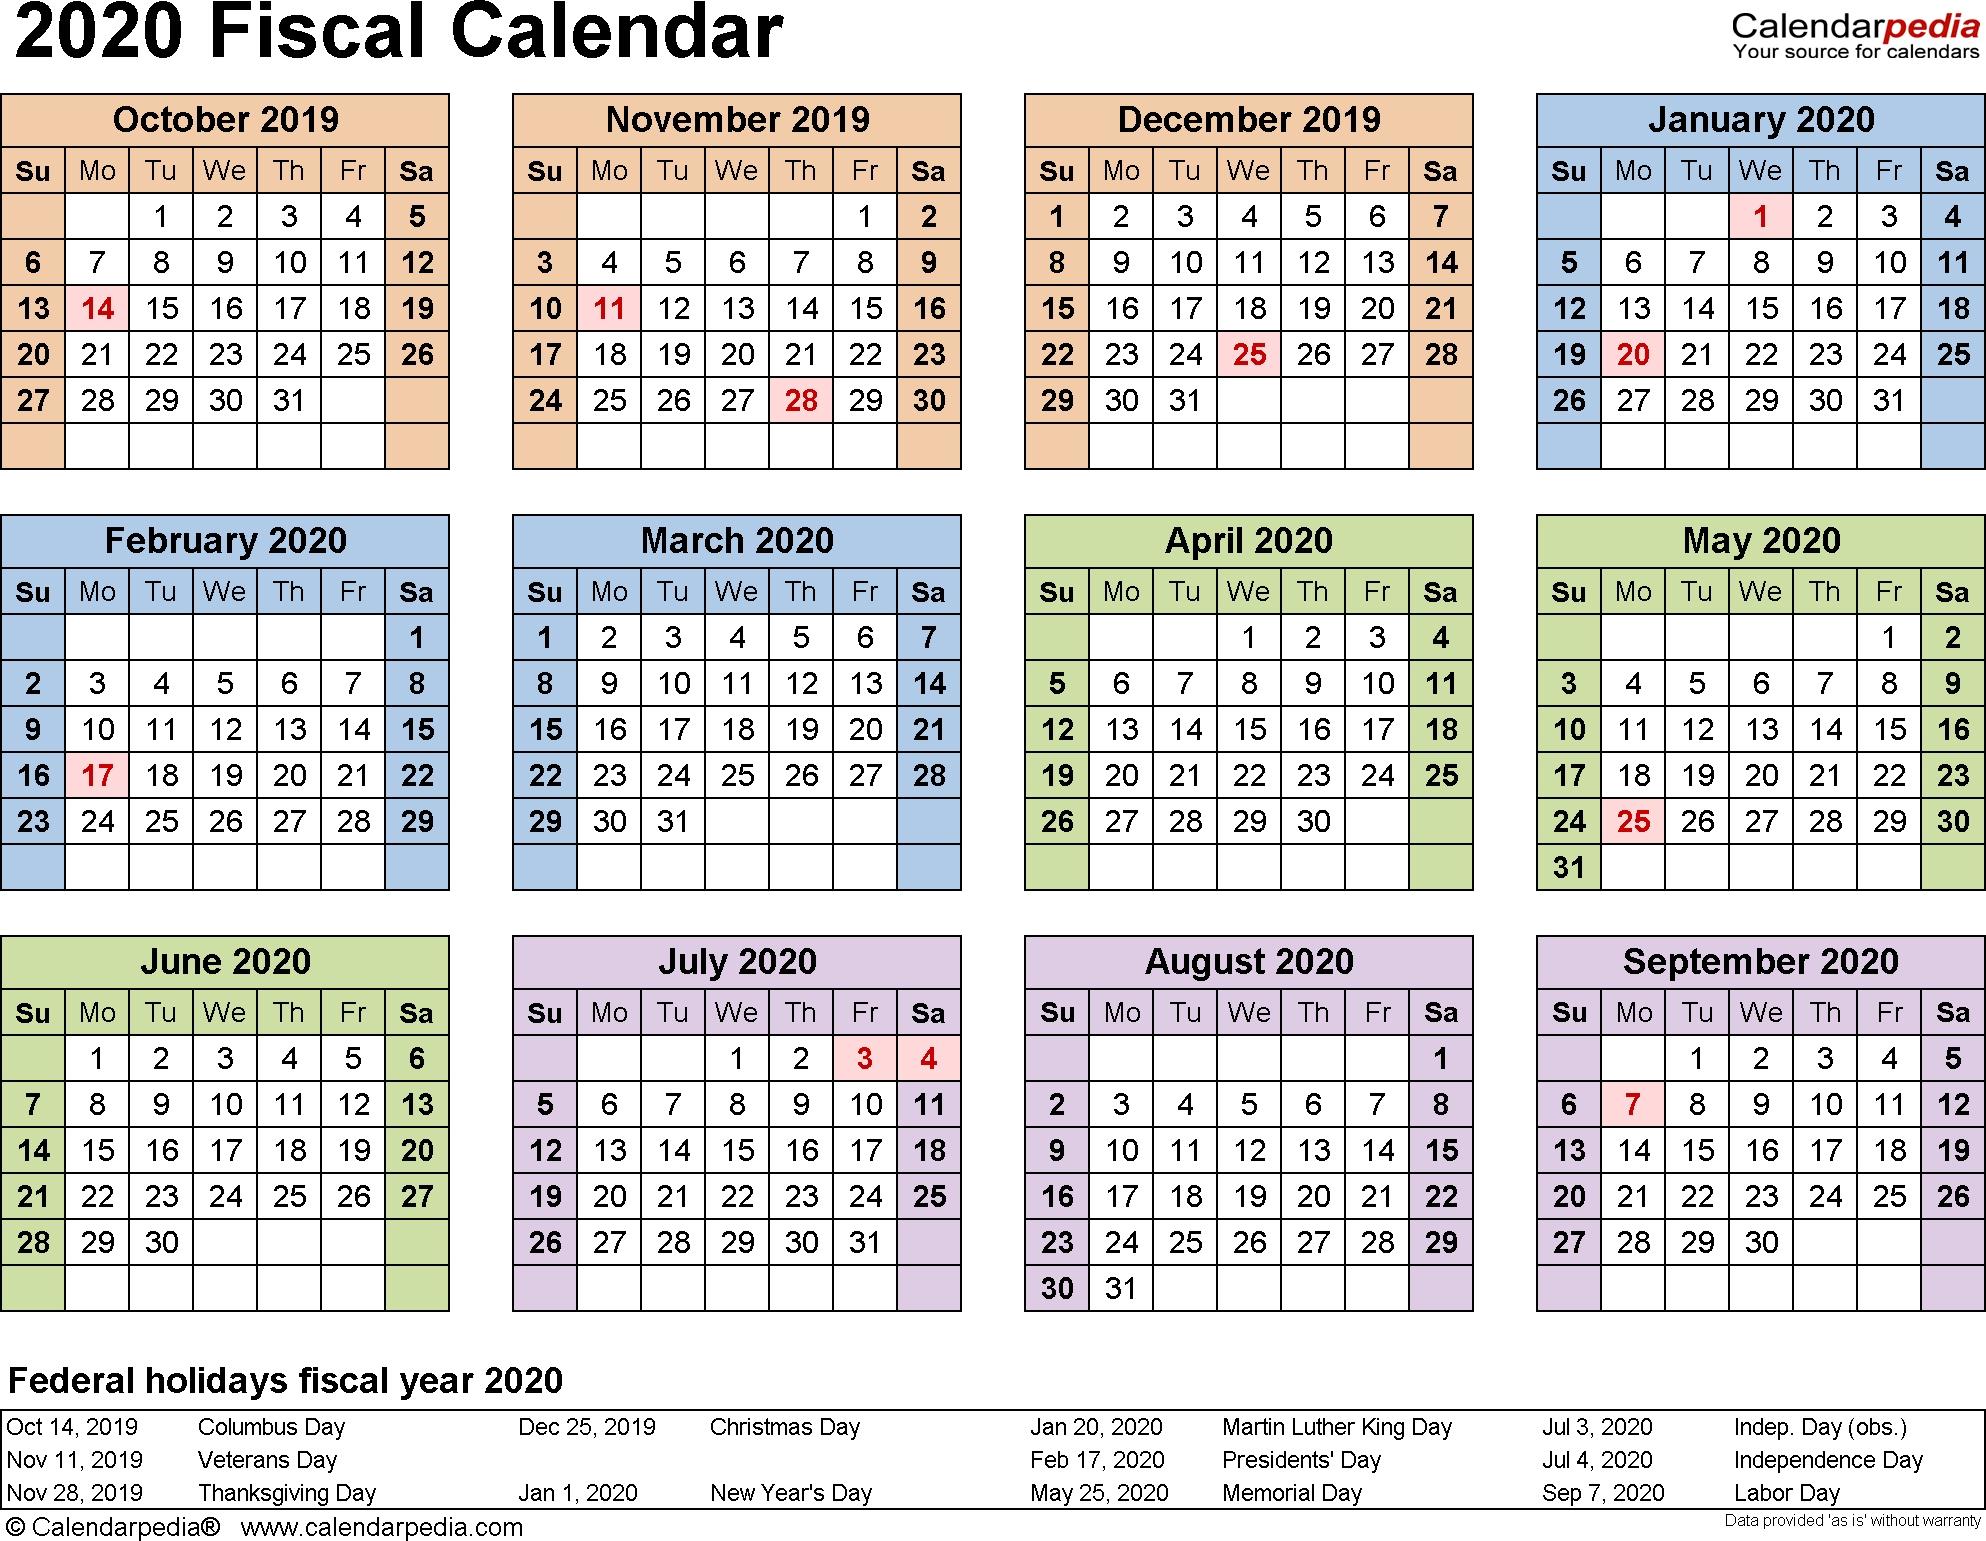 Fiscal Calendars 2020 As Free Printable Pdf Templates with regard to 2020 Julian Calendar Printable Pdf